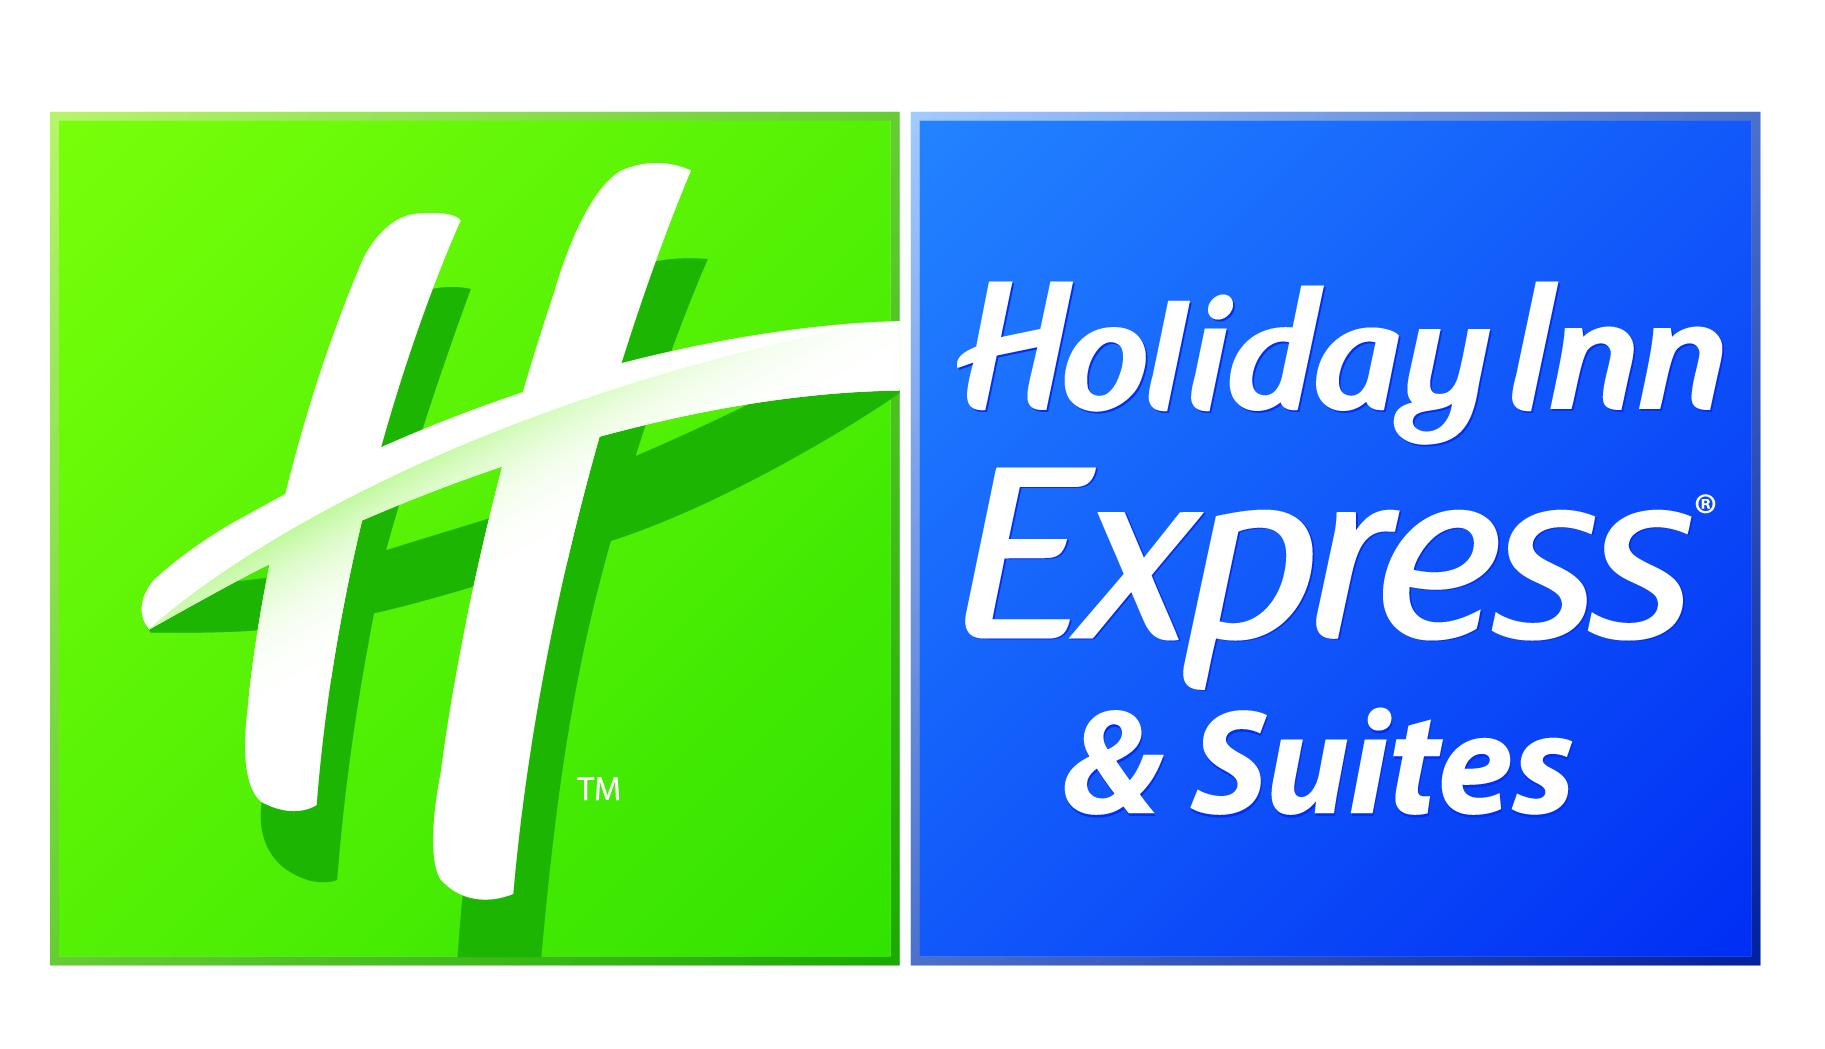 holiday_inn_express (2) [Converted].jpg